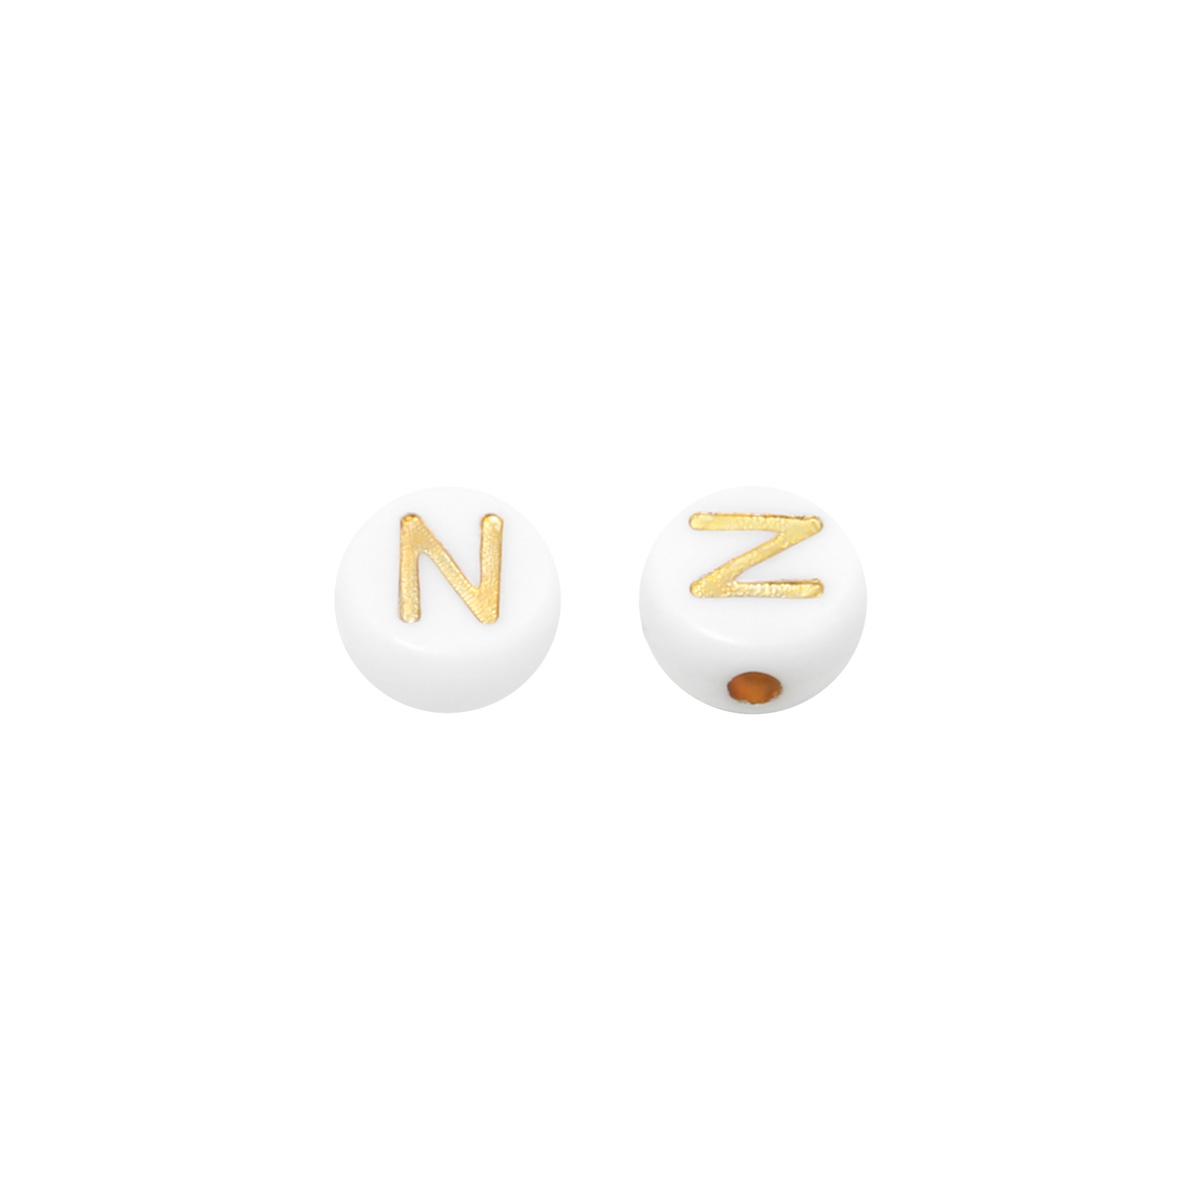 Diy flat beads letter n - 7mm